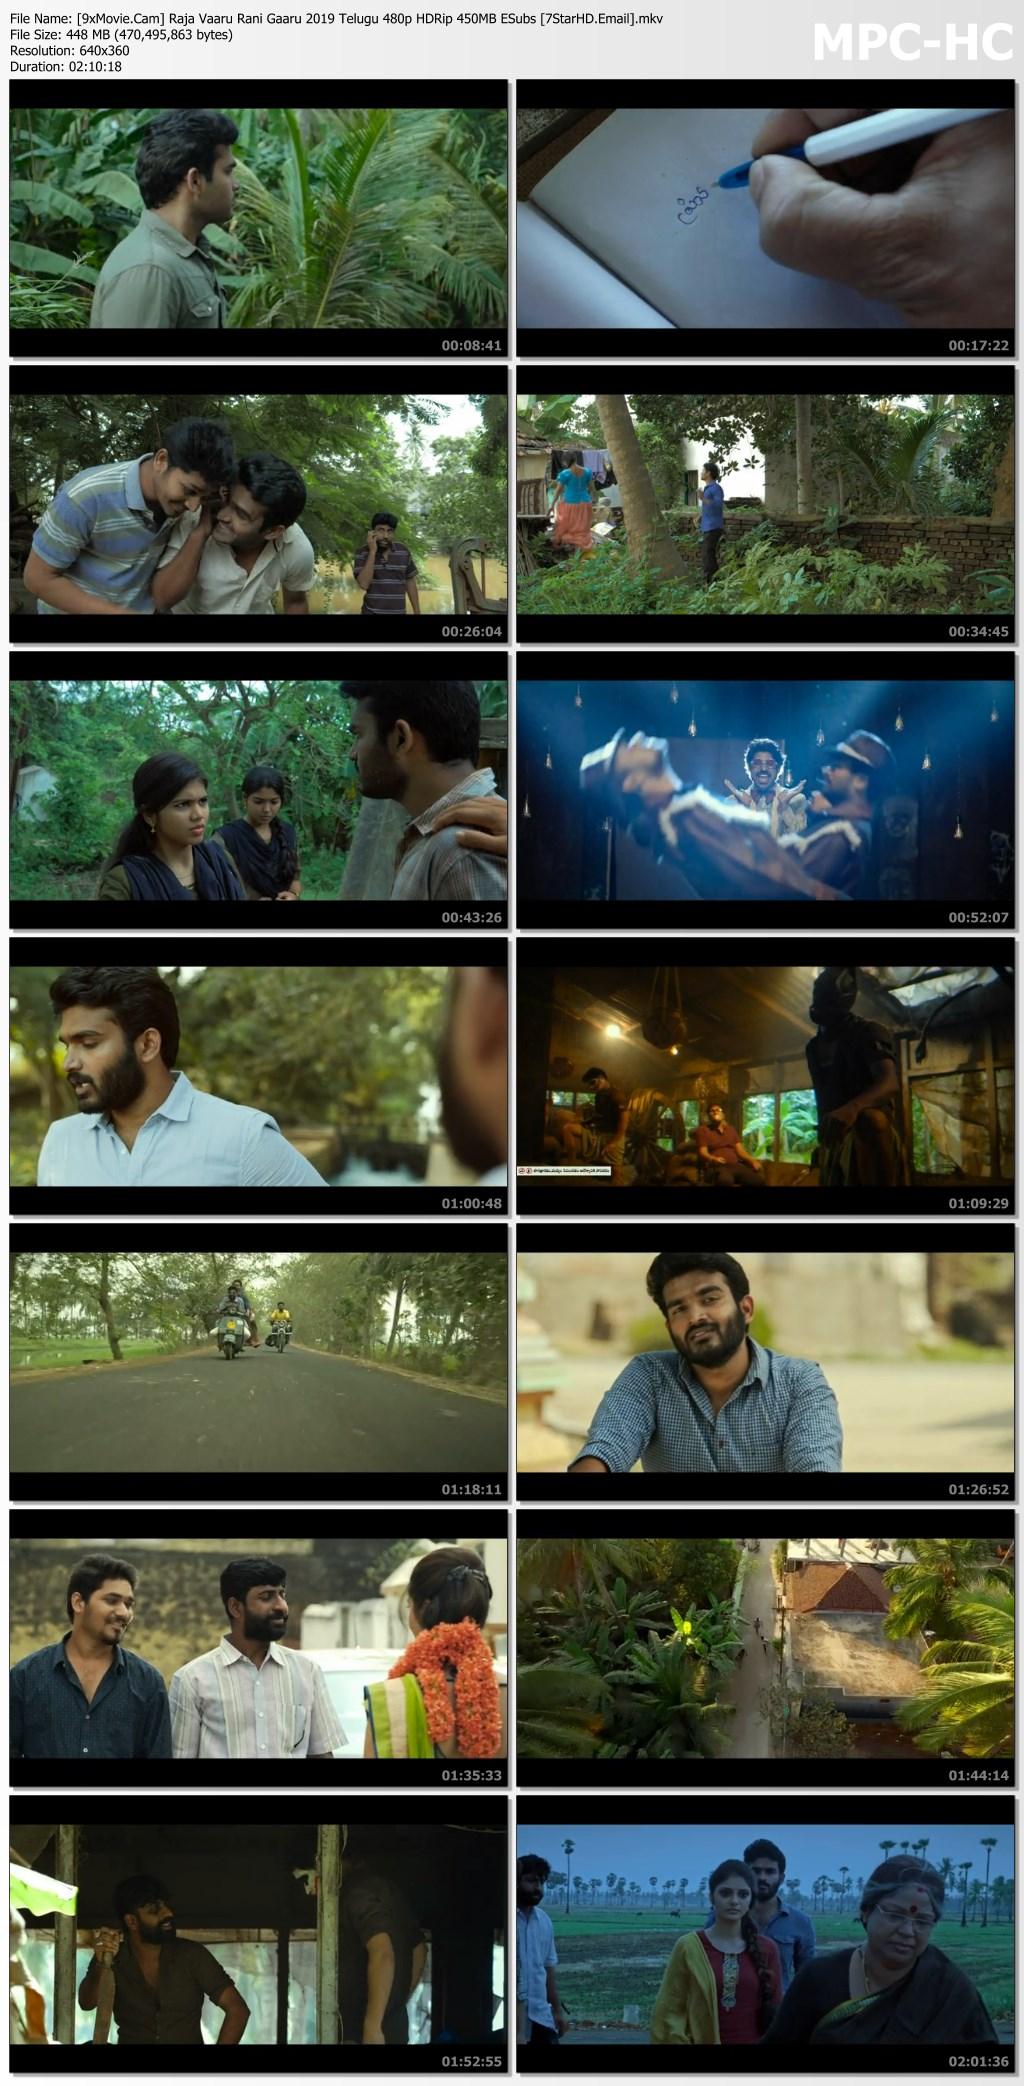 Raja Vaaru Rani Gaaru 2019 Telugu 480p HDRip x264 400MB ESubs